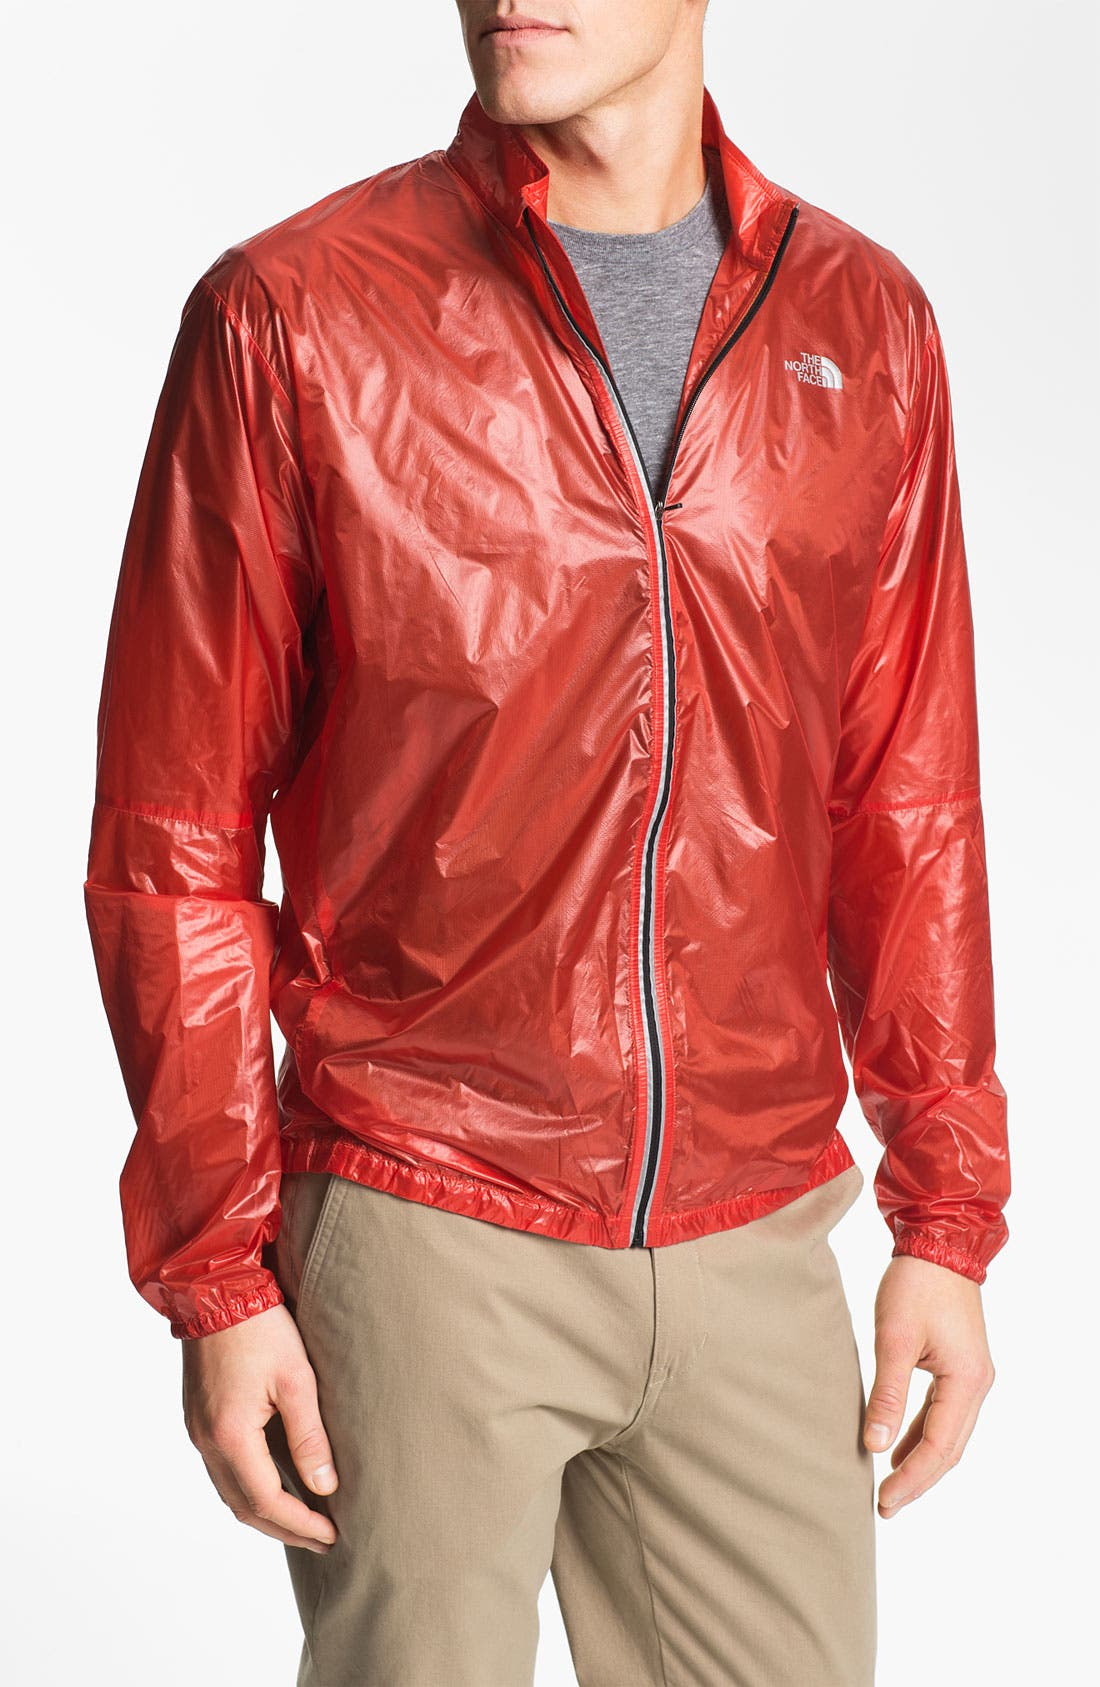 Main Image - The North Face 'Accomack' Packable Nylon Jacket